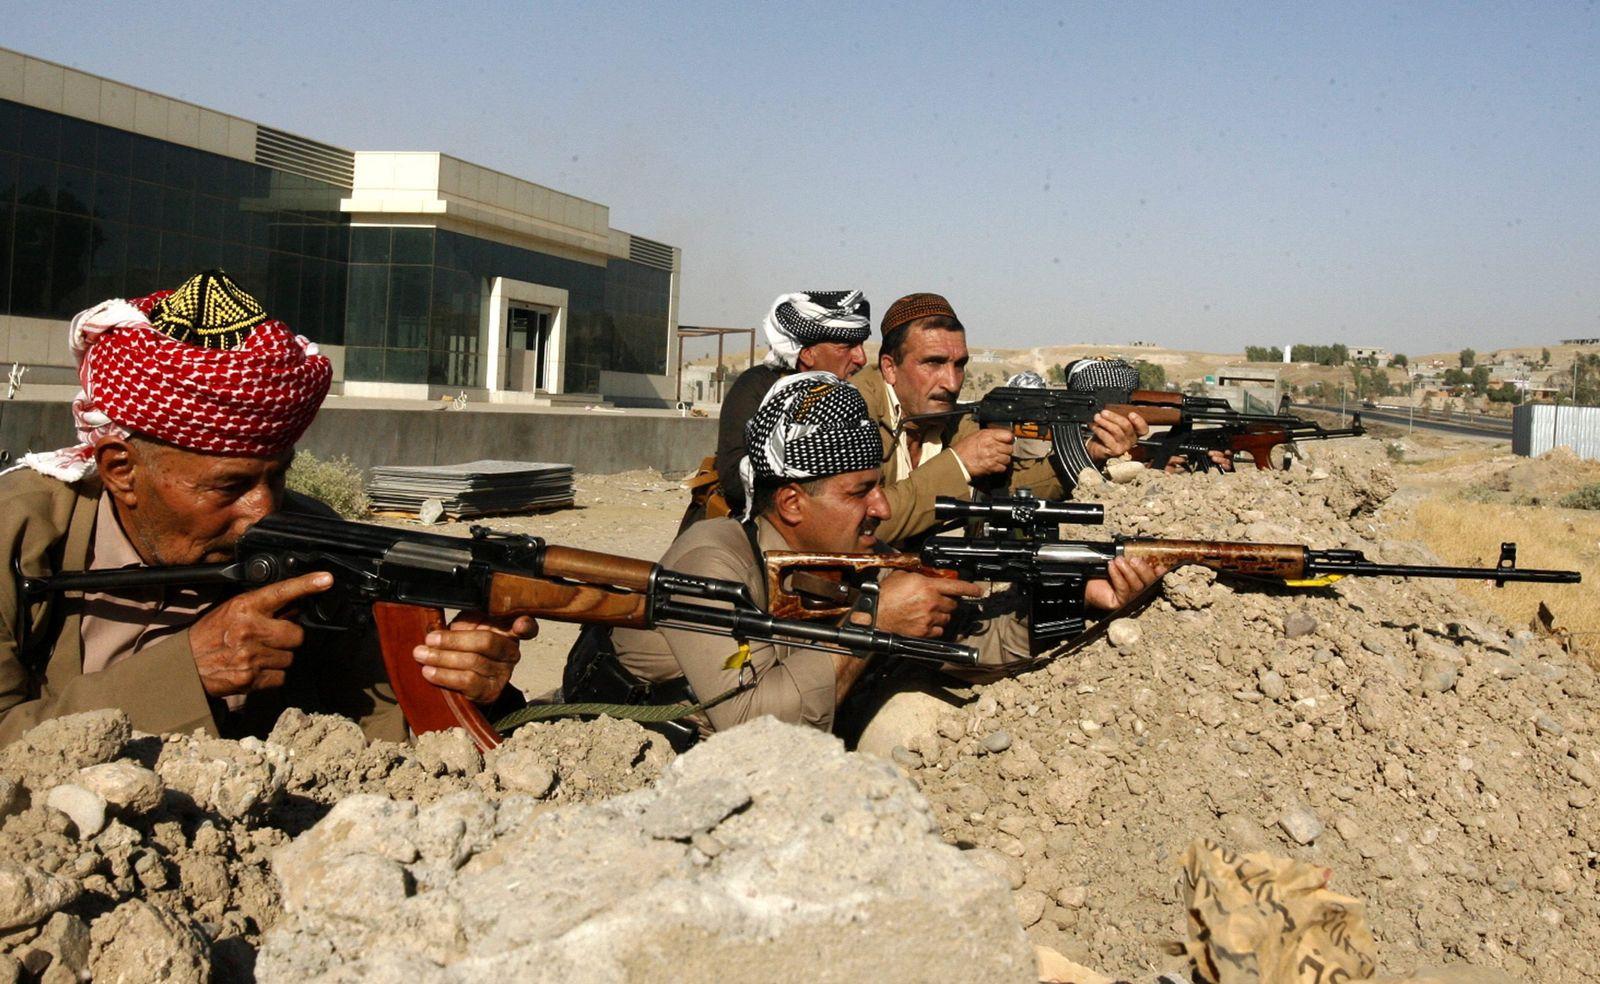 Islamic State Jihadists expand foothold in northern Iraq